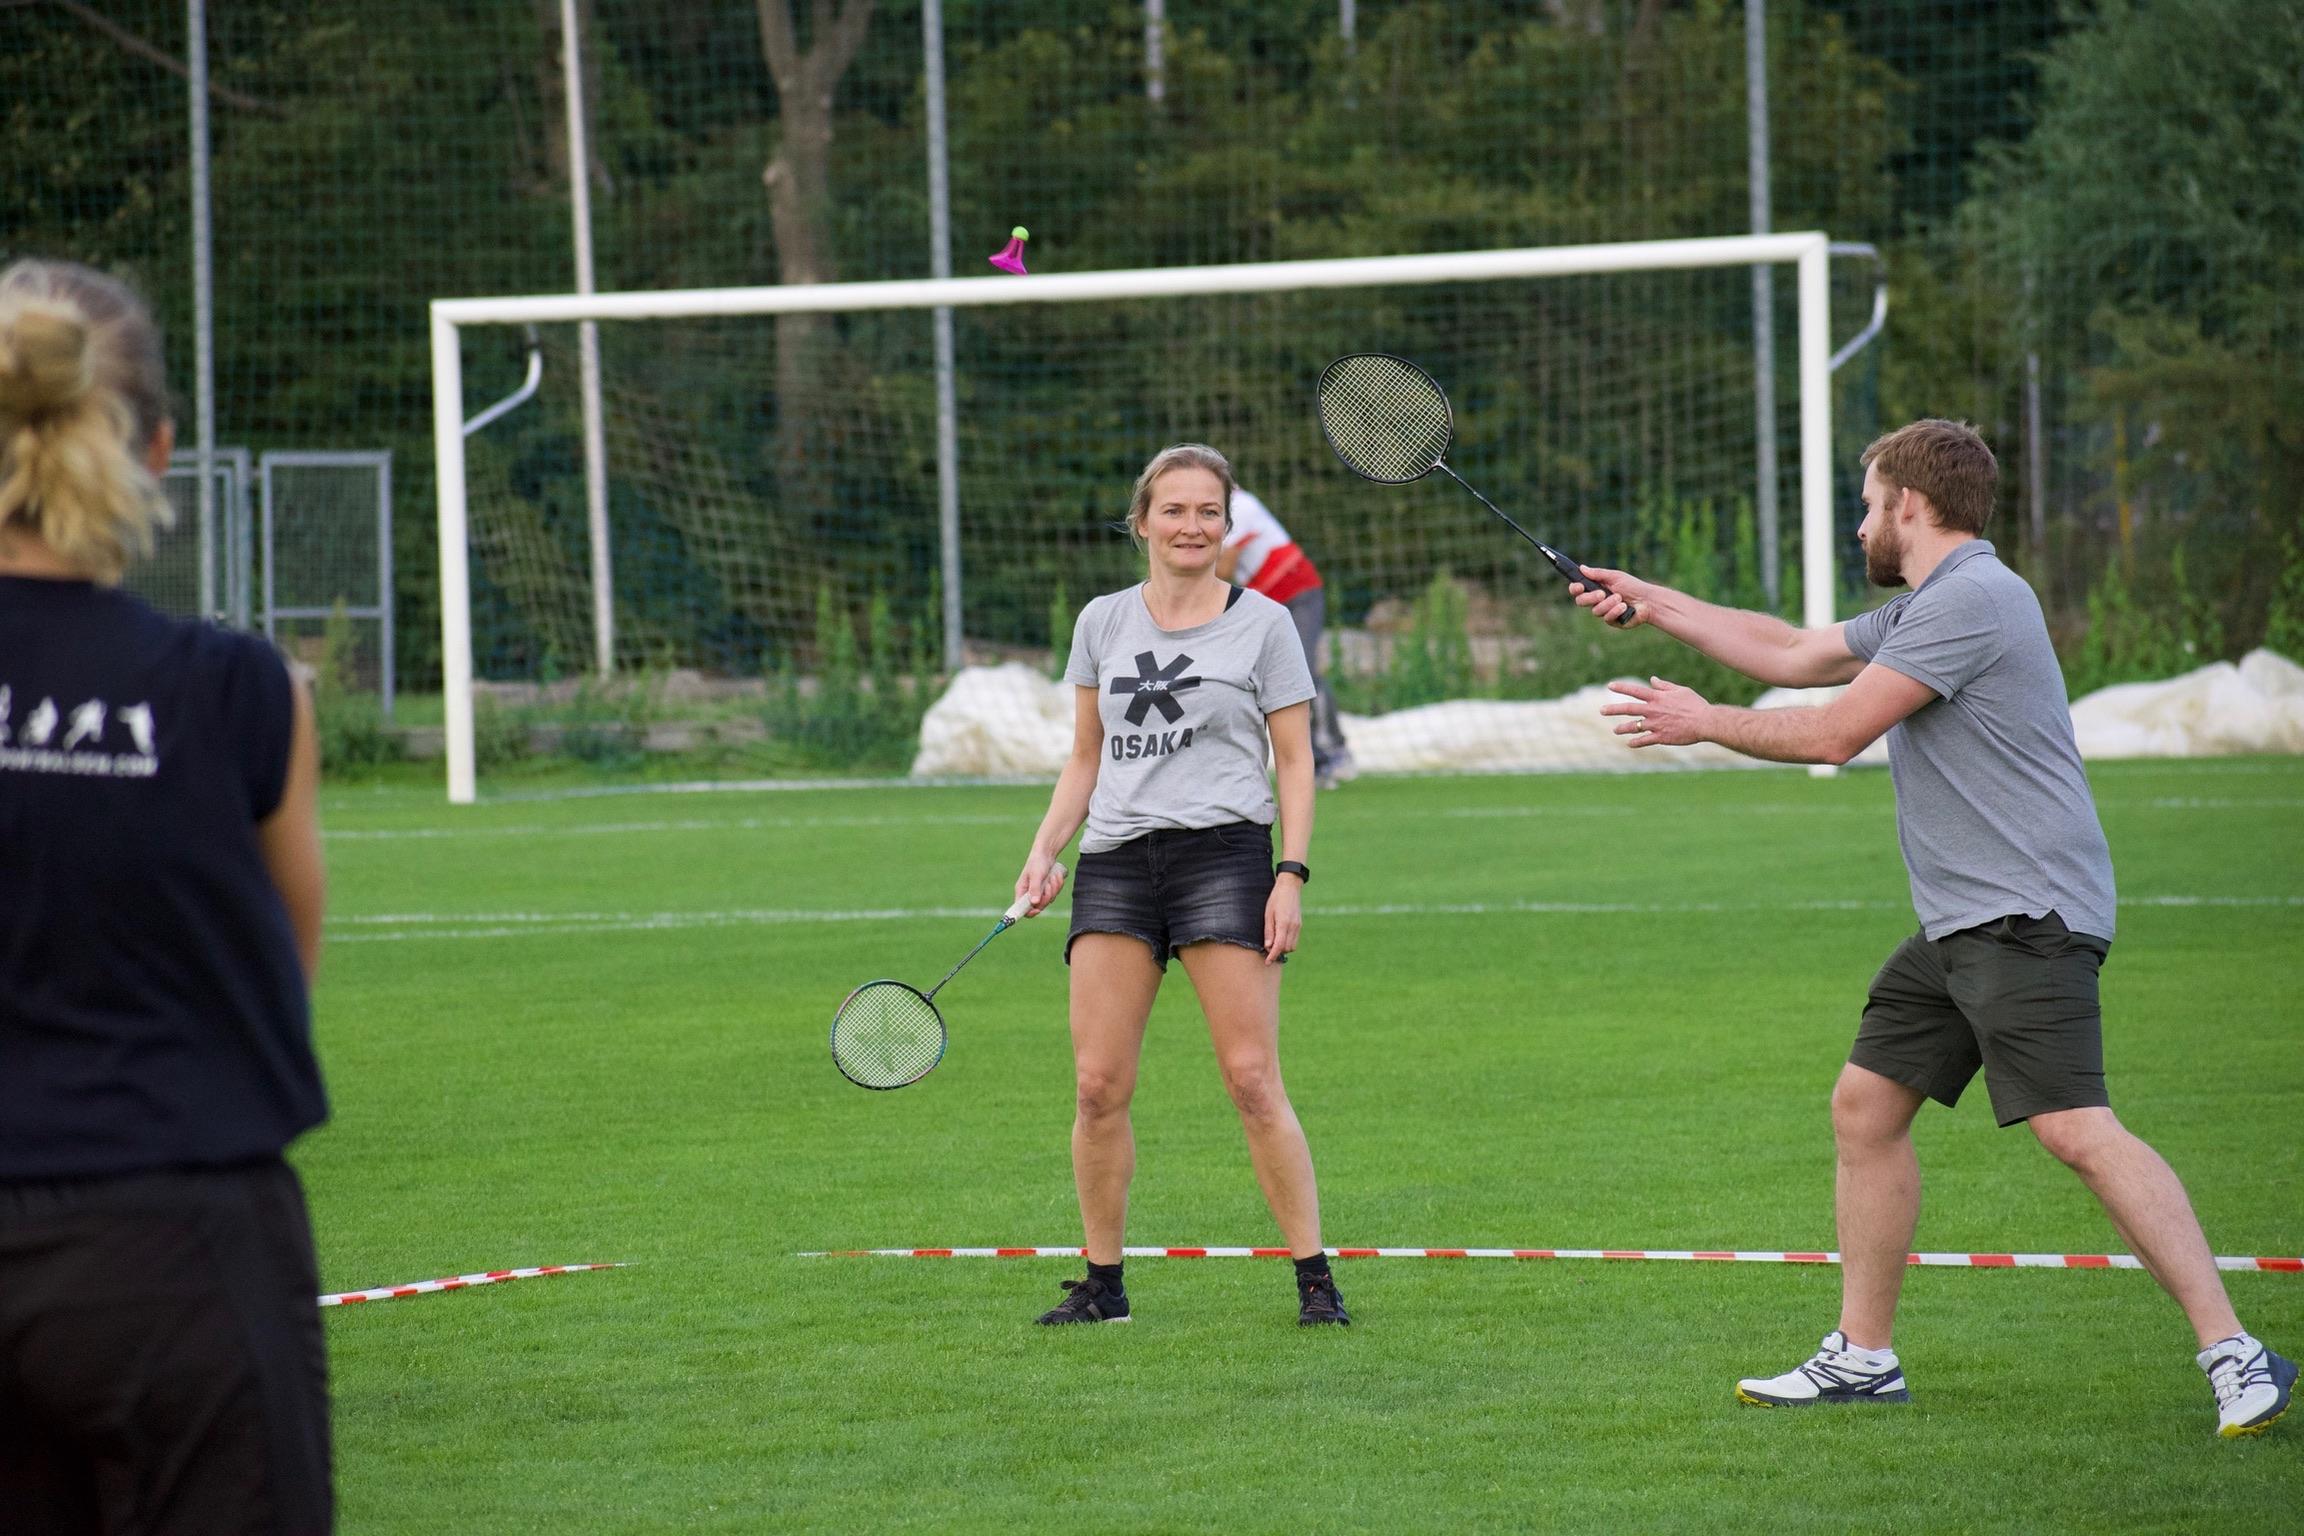 Buiten spelen badminton mascha stuart